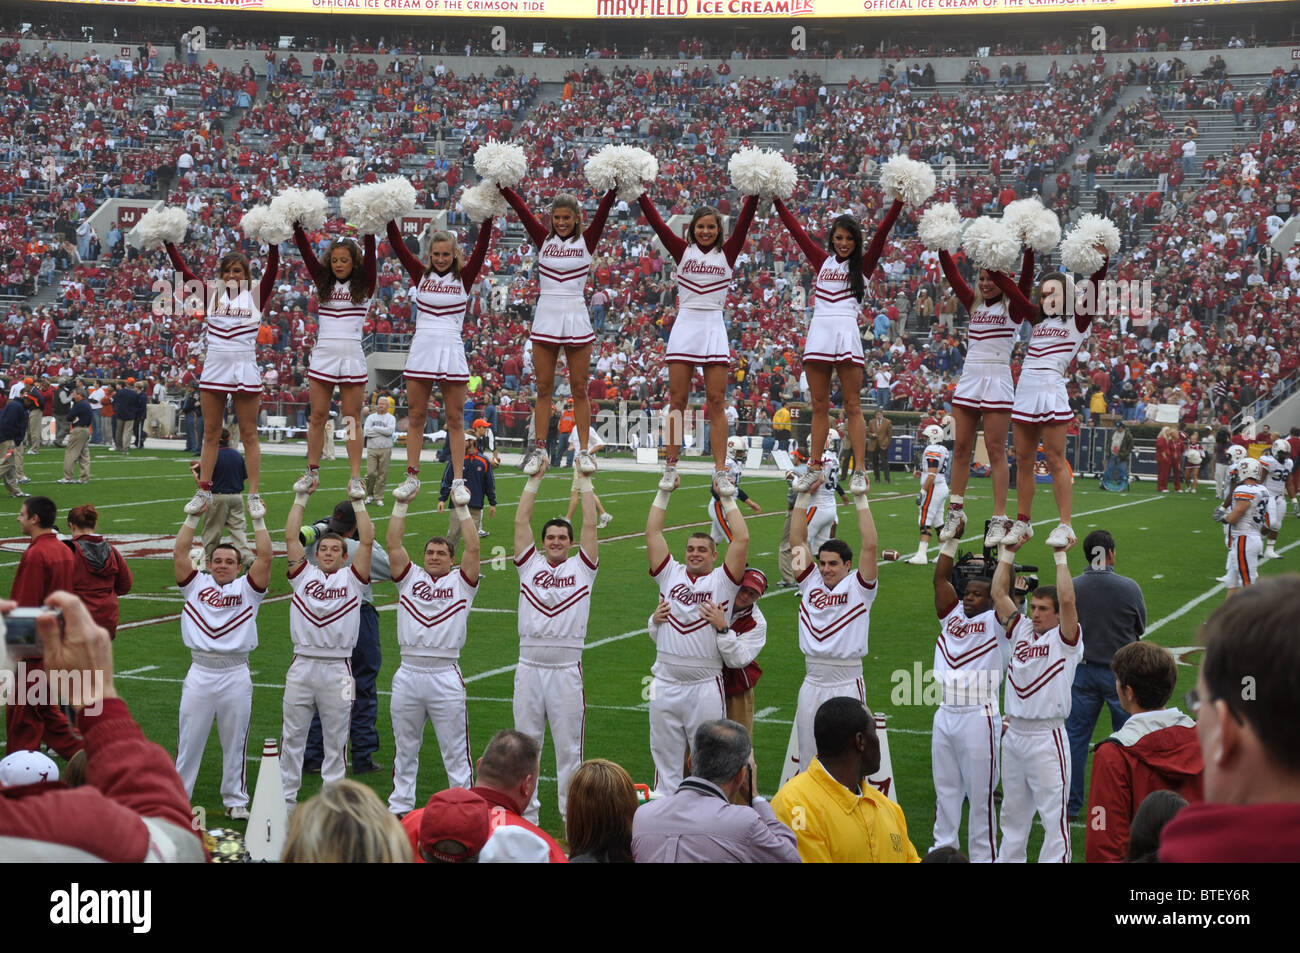 University of Alabama cheerleaders performing at football game. - Stock Image